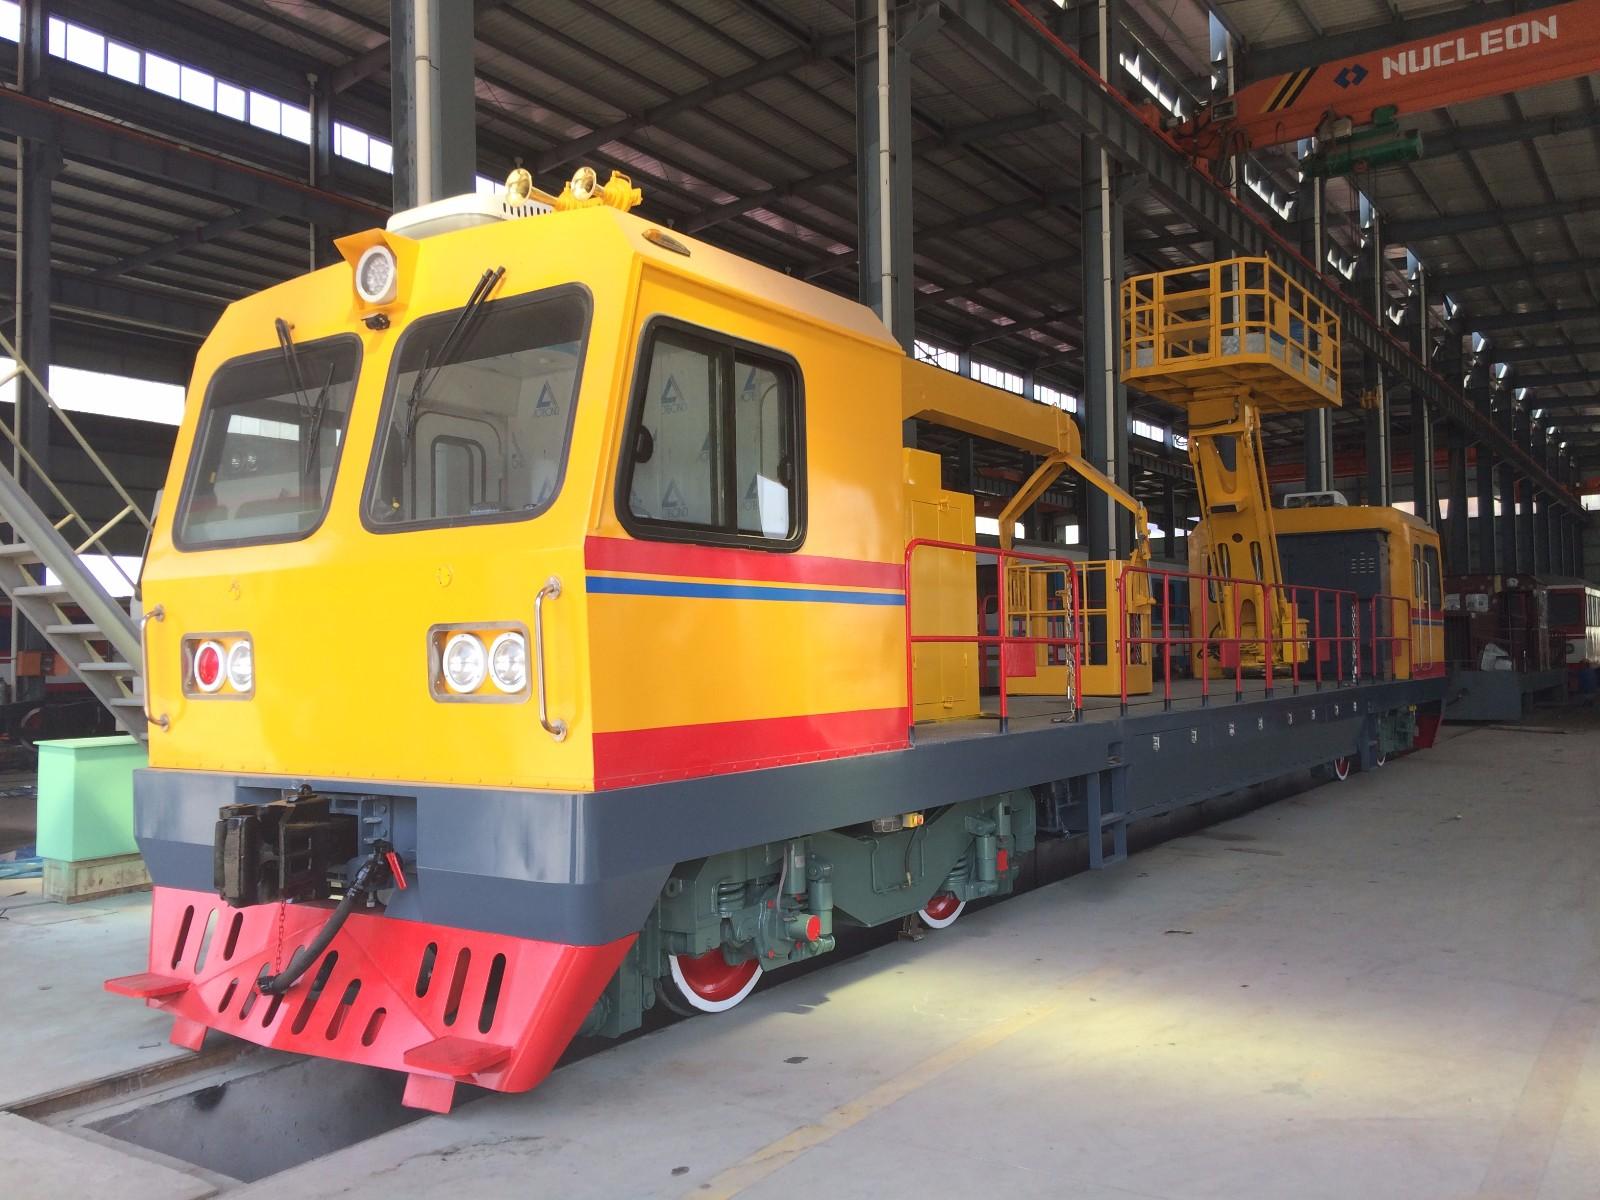 locomotoras?  locomotoras?in?Other?Mining?Machineslocomotoras?in?Locomotives  locomotive?parts?  loc